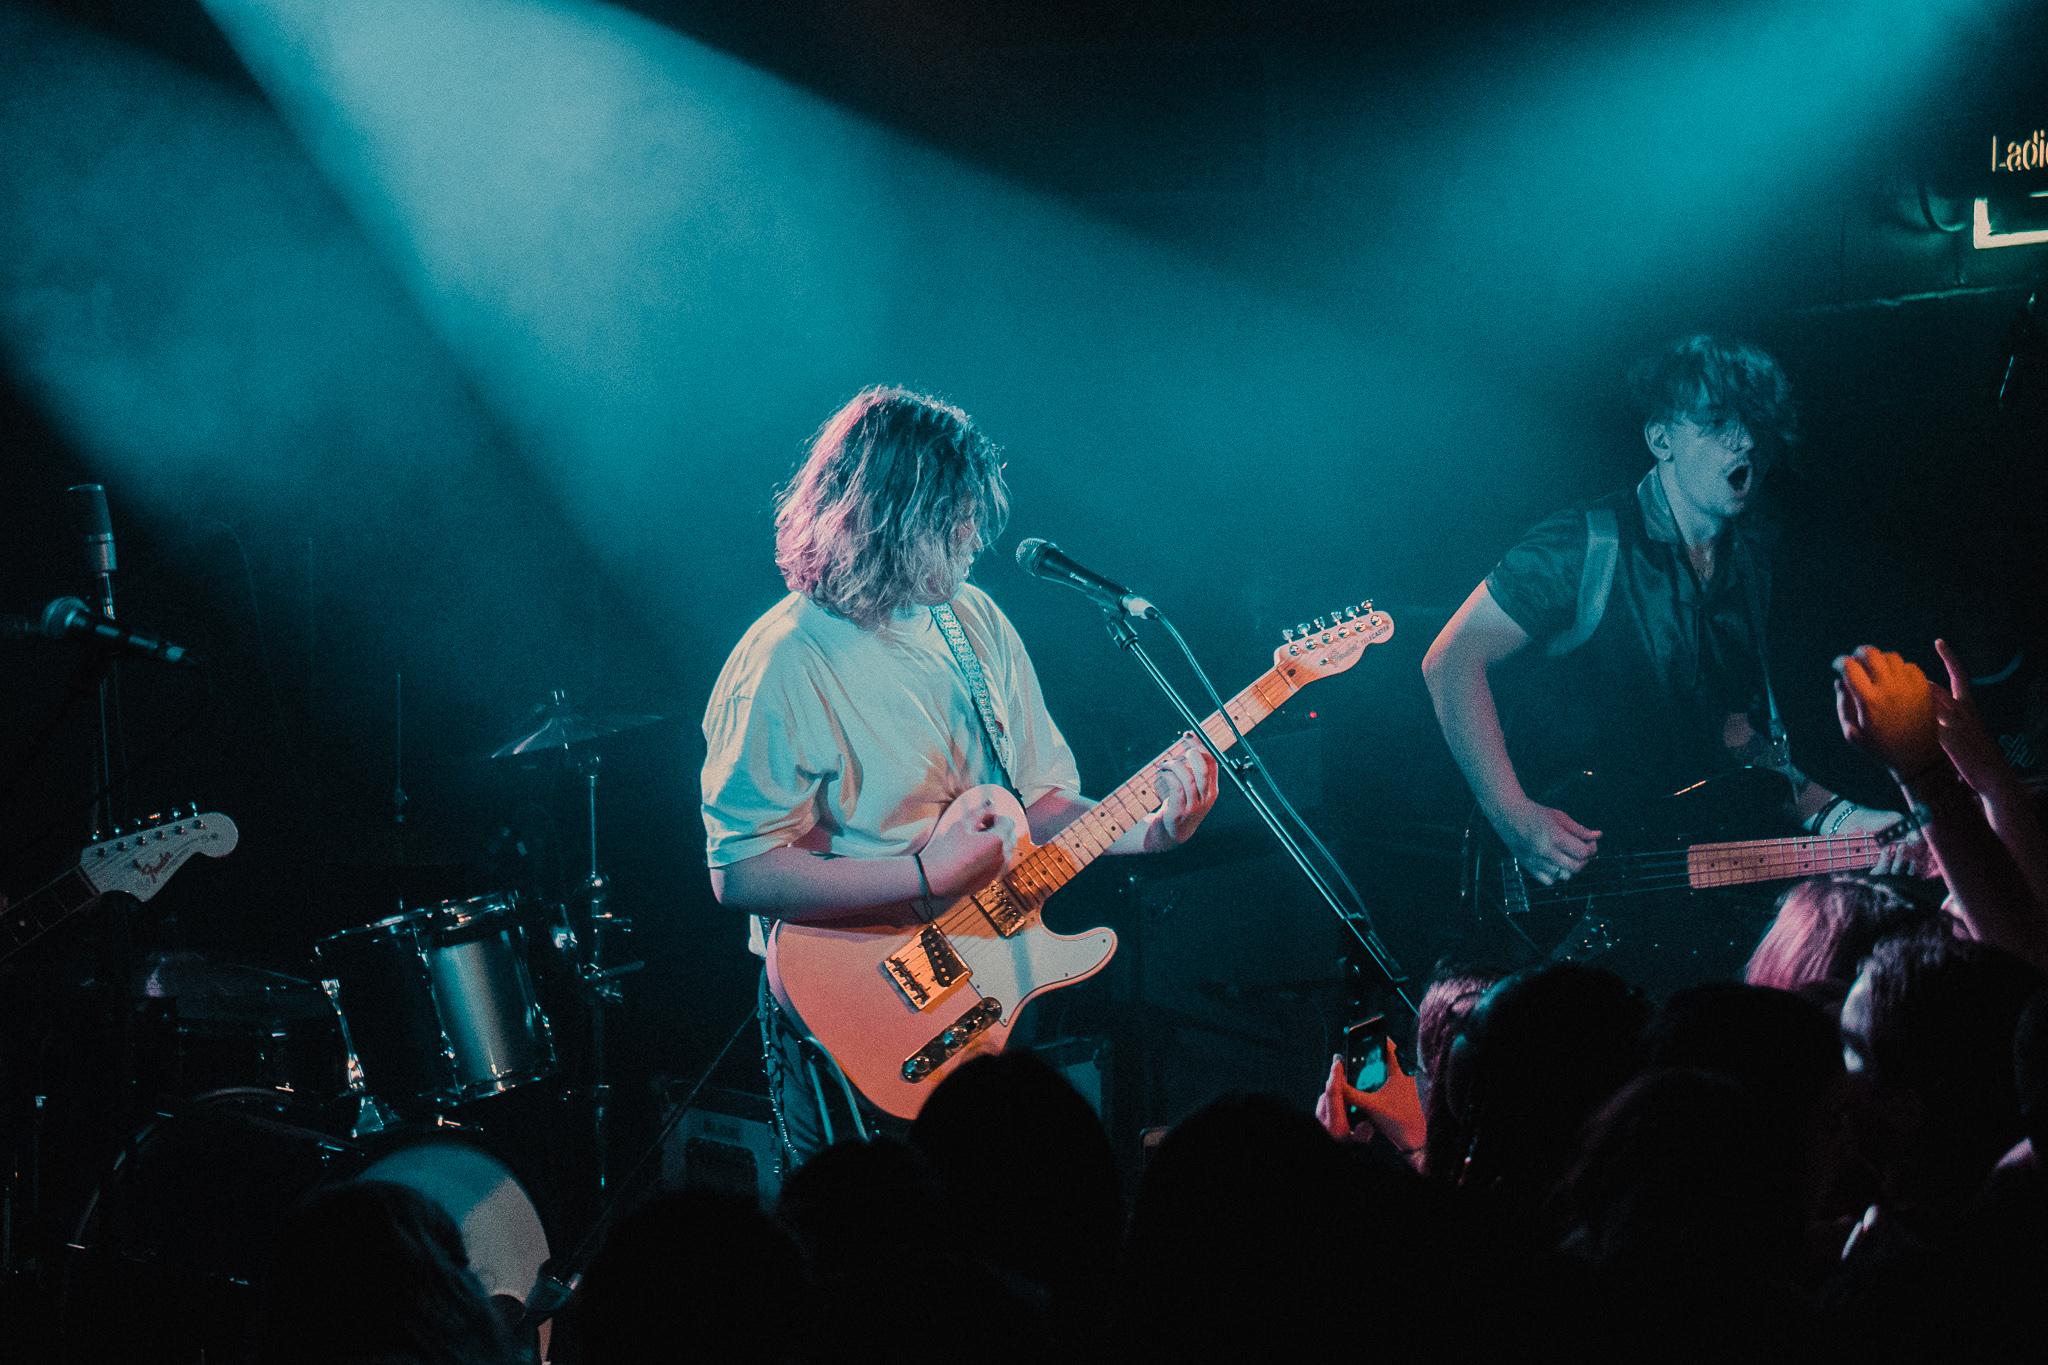 Photo Gallery: Bloxx & Vistas - Dingwalls, London 10/04/2019